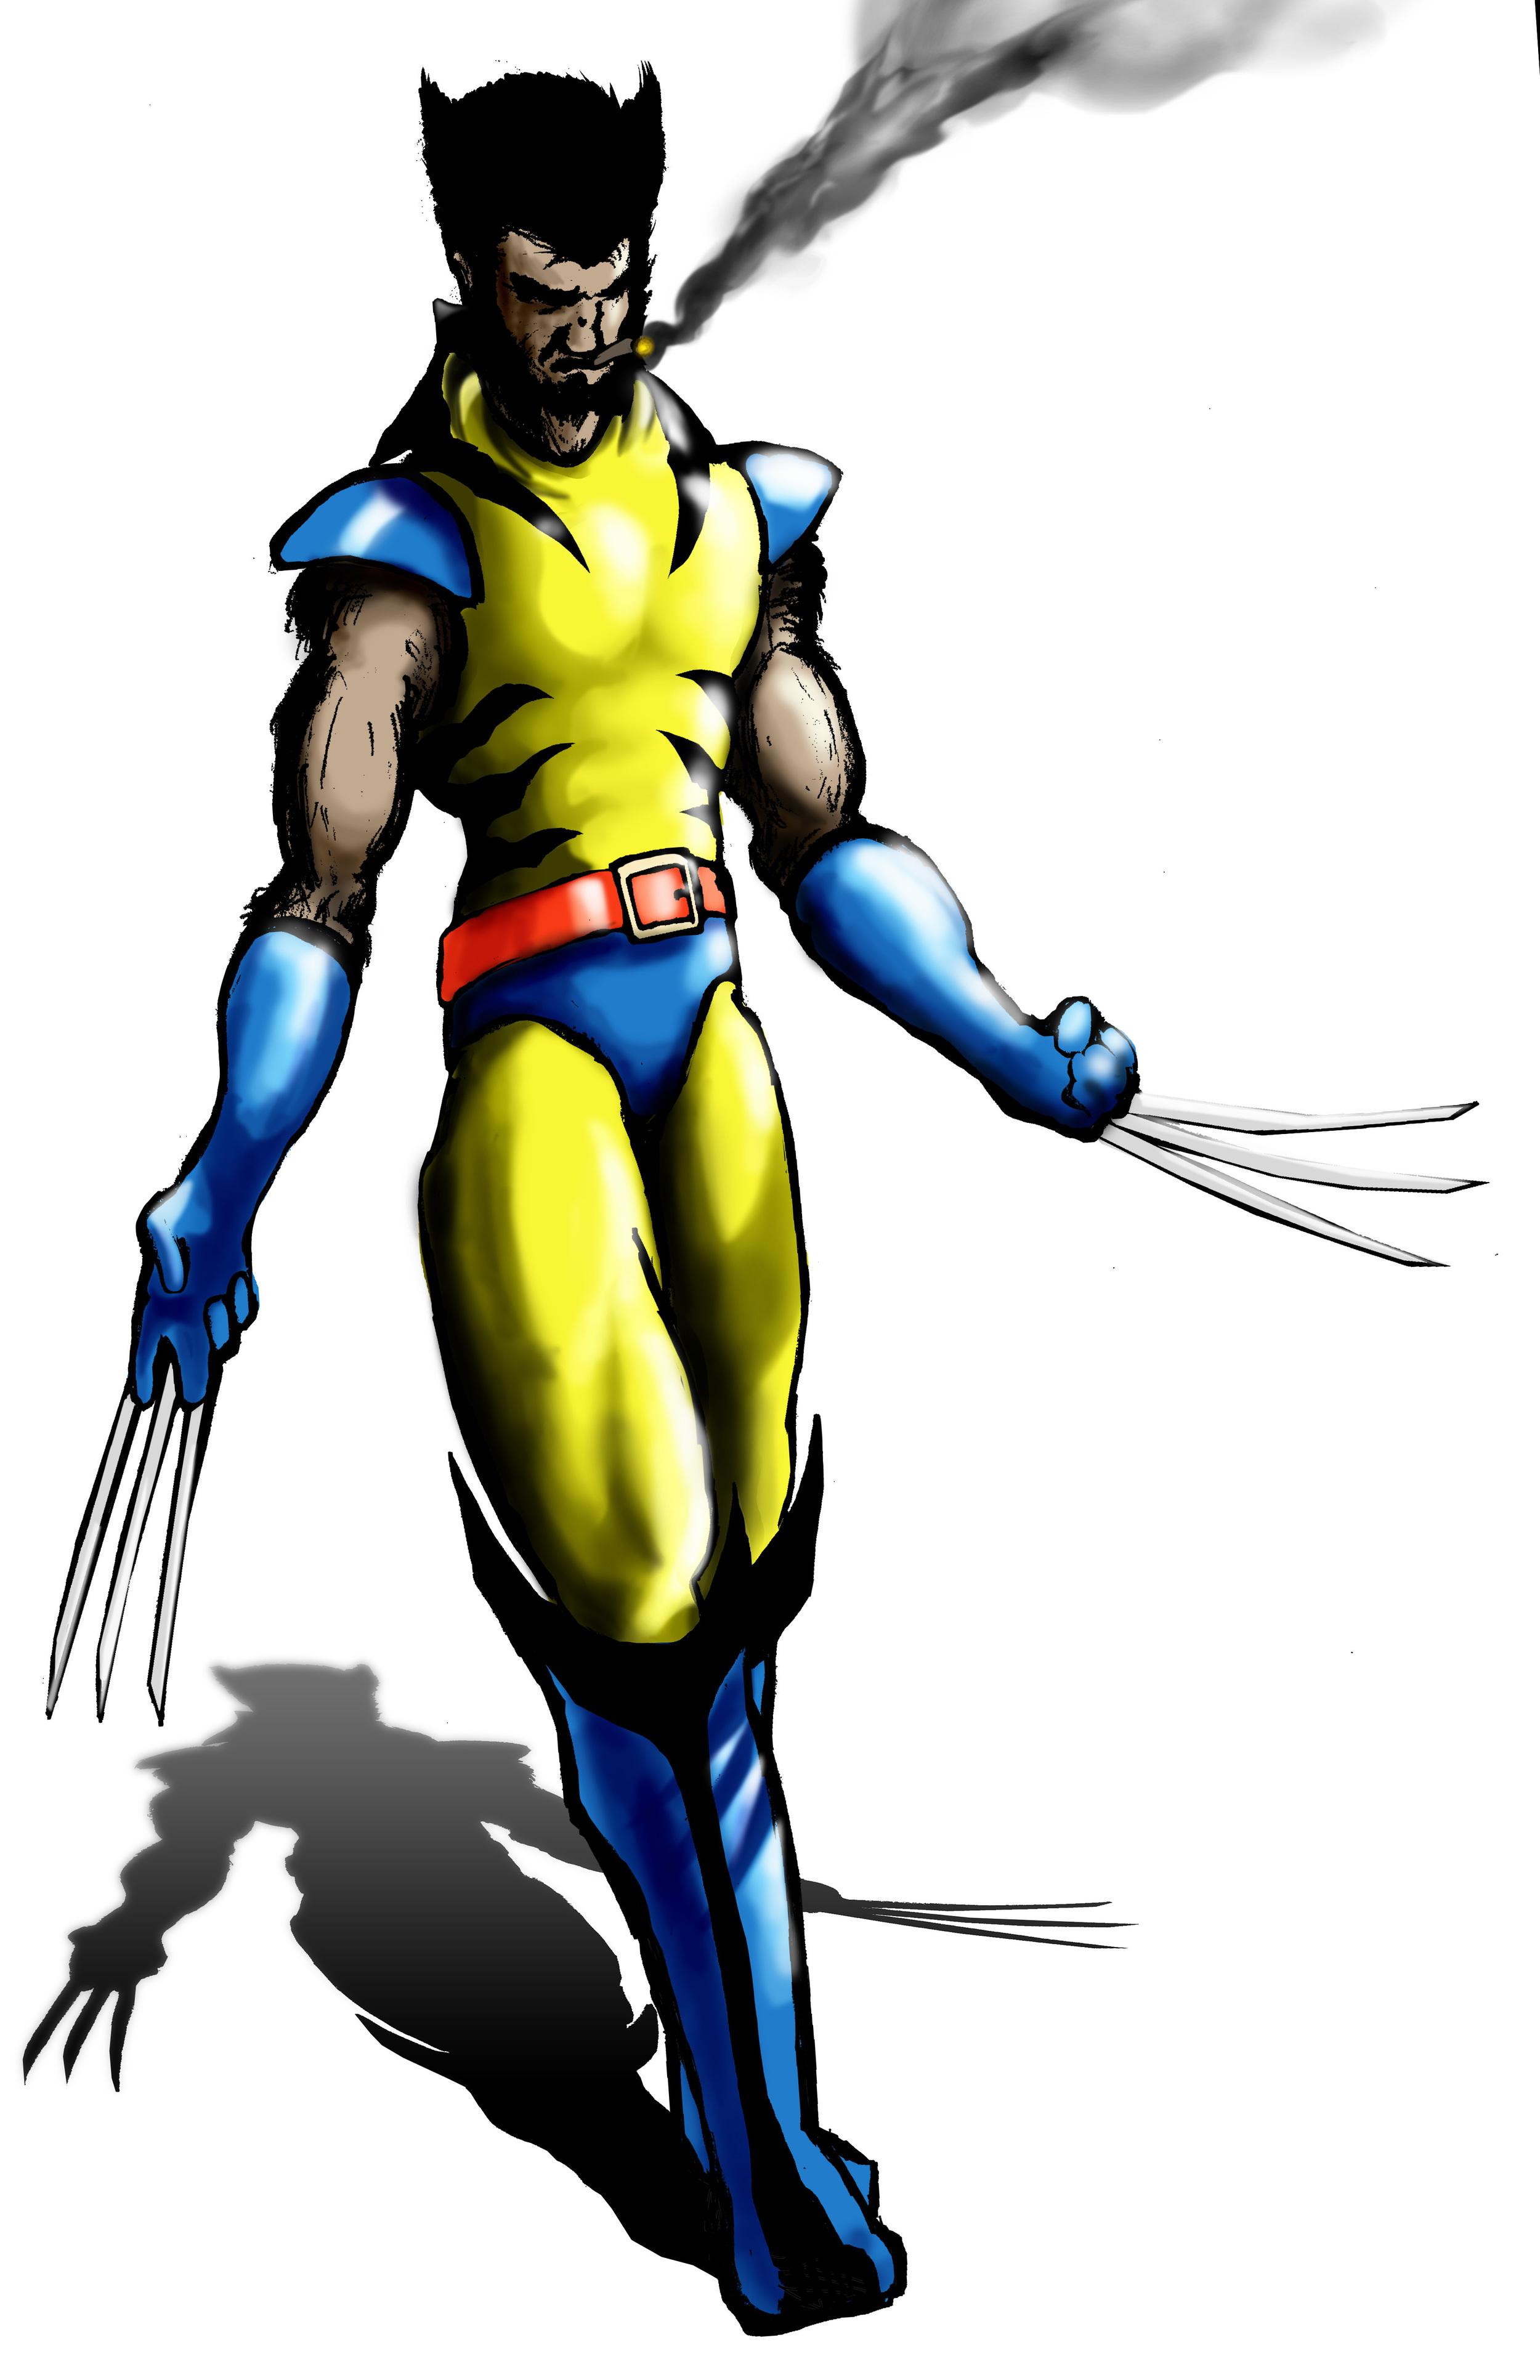 Wolverine-Yellow Spandex 11x17.jpg